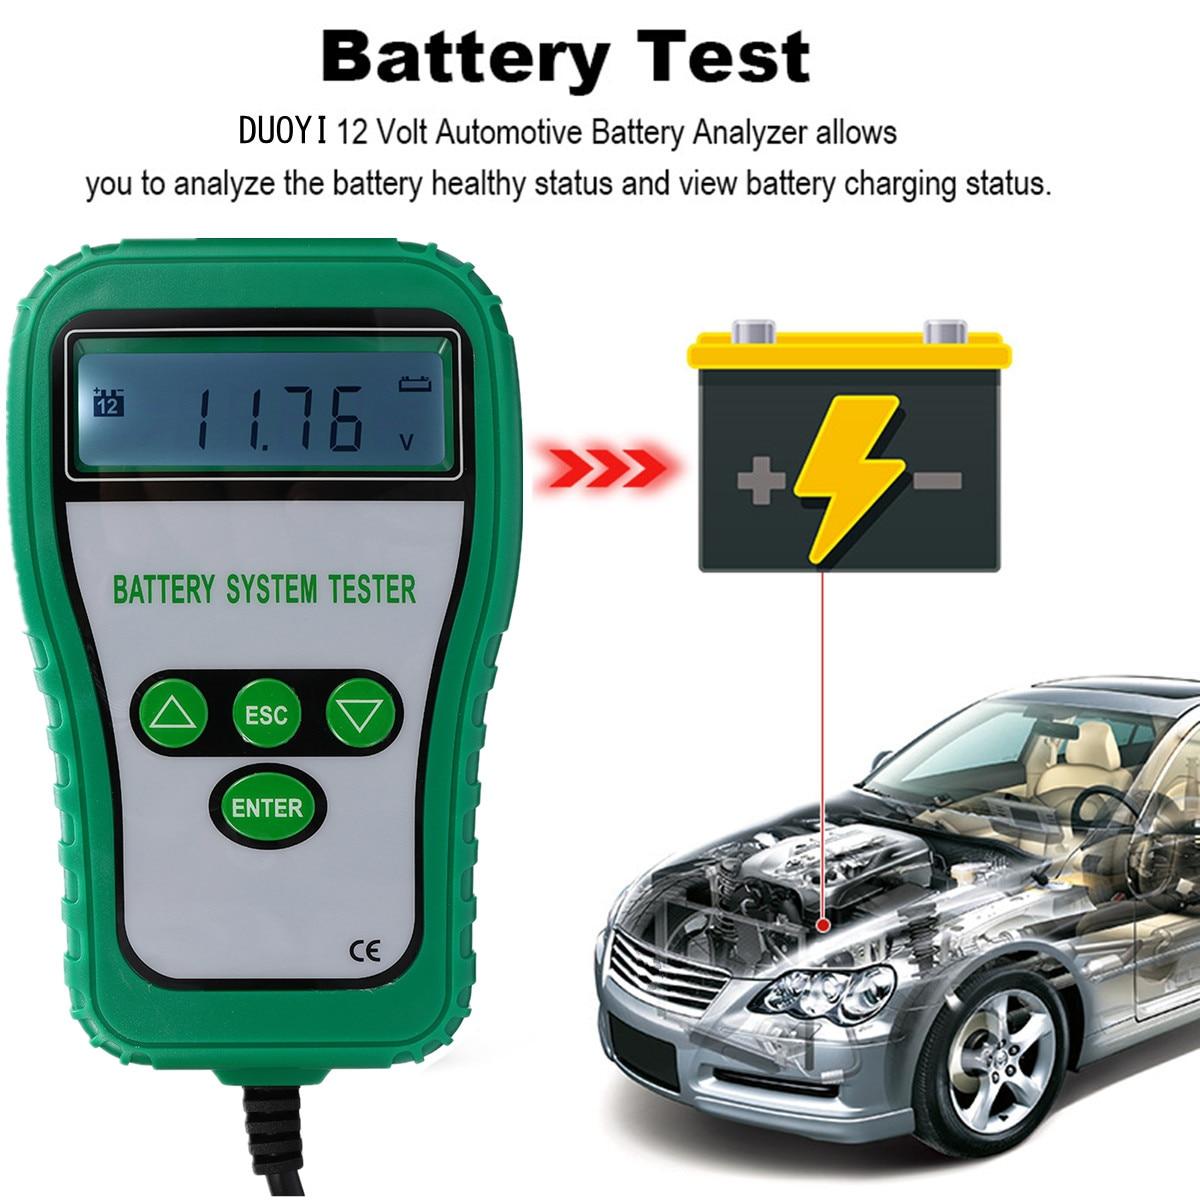 12V LCD Digital Battery Tester Analyzer Alternator Battery System Tester Cranking Amps Battery Resistance Voltage Life Analysis new 12v battery load display testing system tester alternator tool with clips